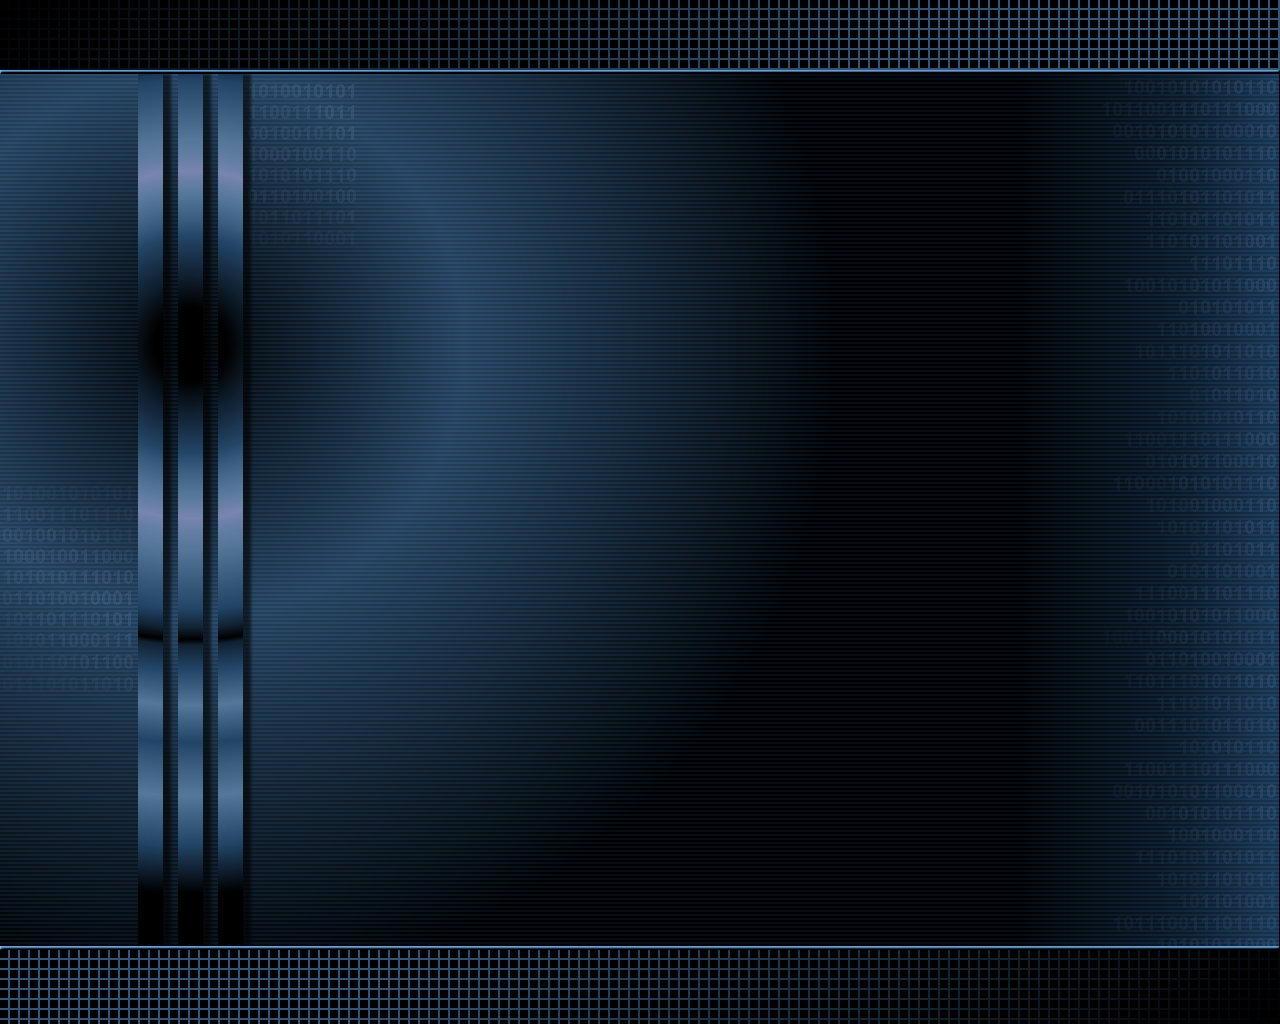 Crystalforge WP by bardicstorm